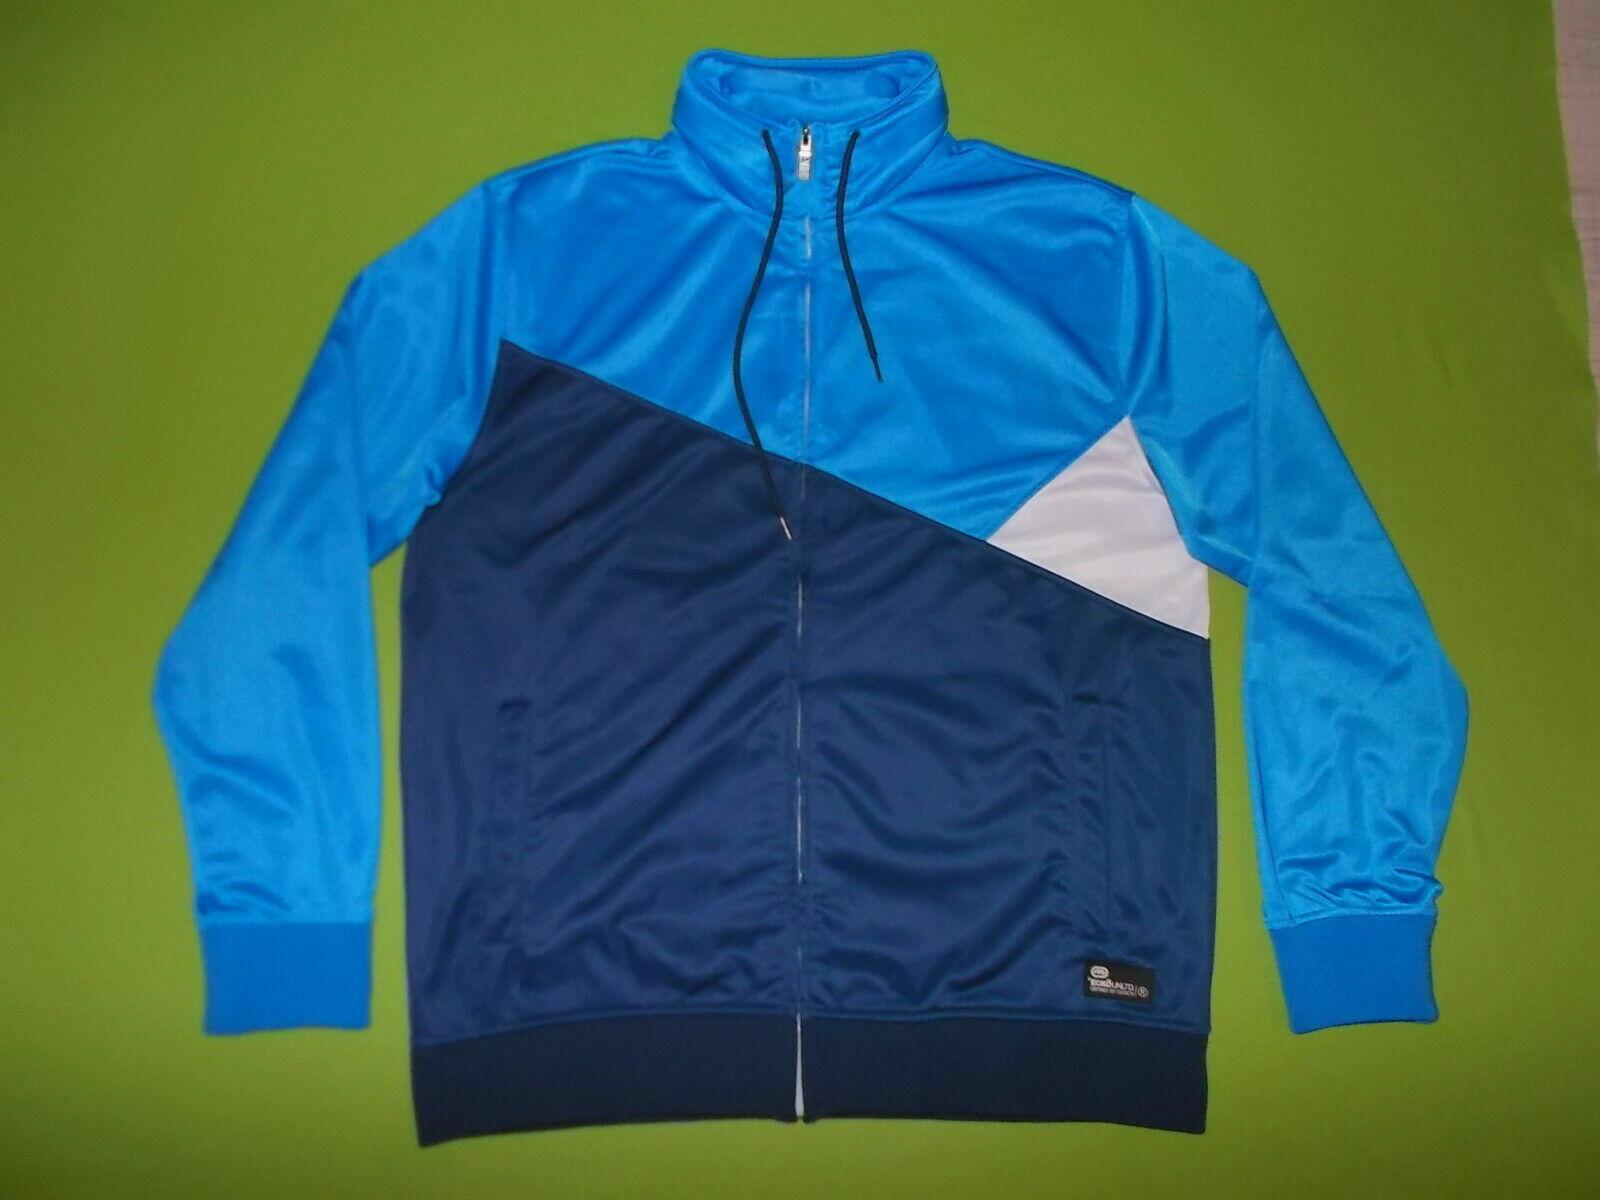 Jacket ECKO UNLTD. (3XL) (XXXL) PERFECT TRACKSUIT TOP HIP-HOP RAP Blue Hoodie